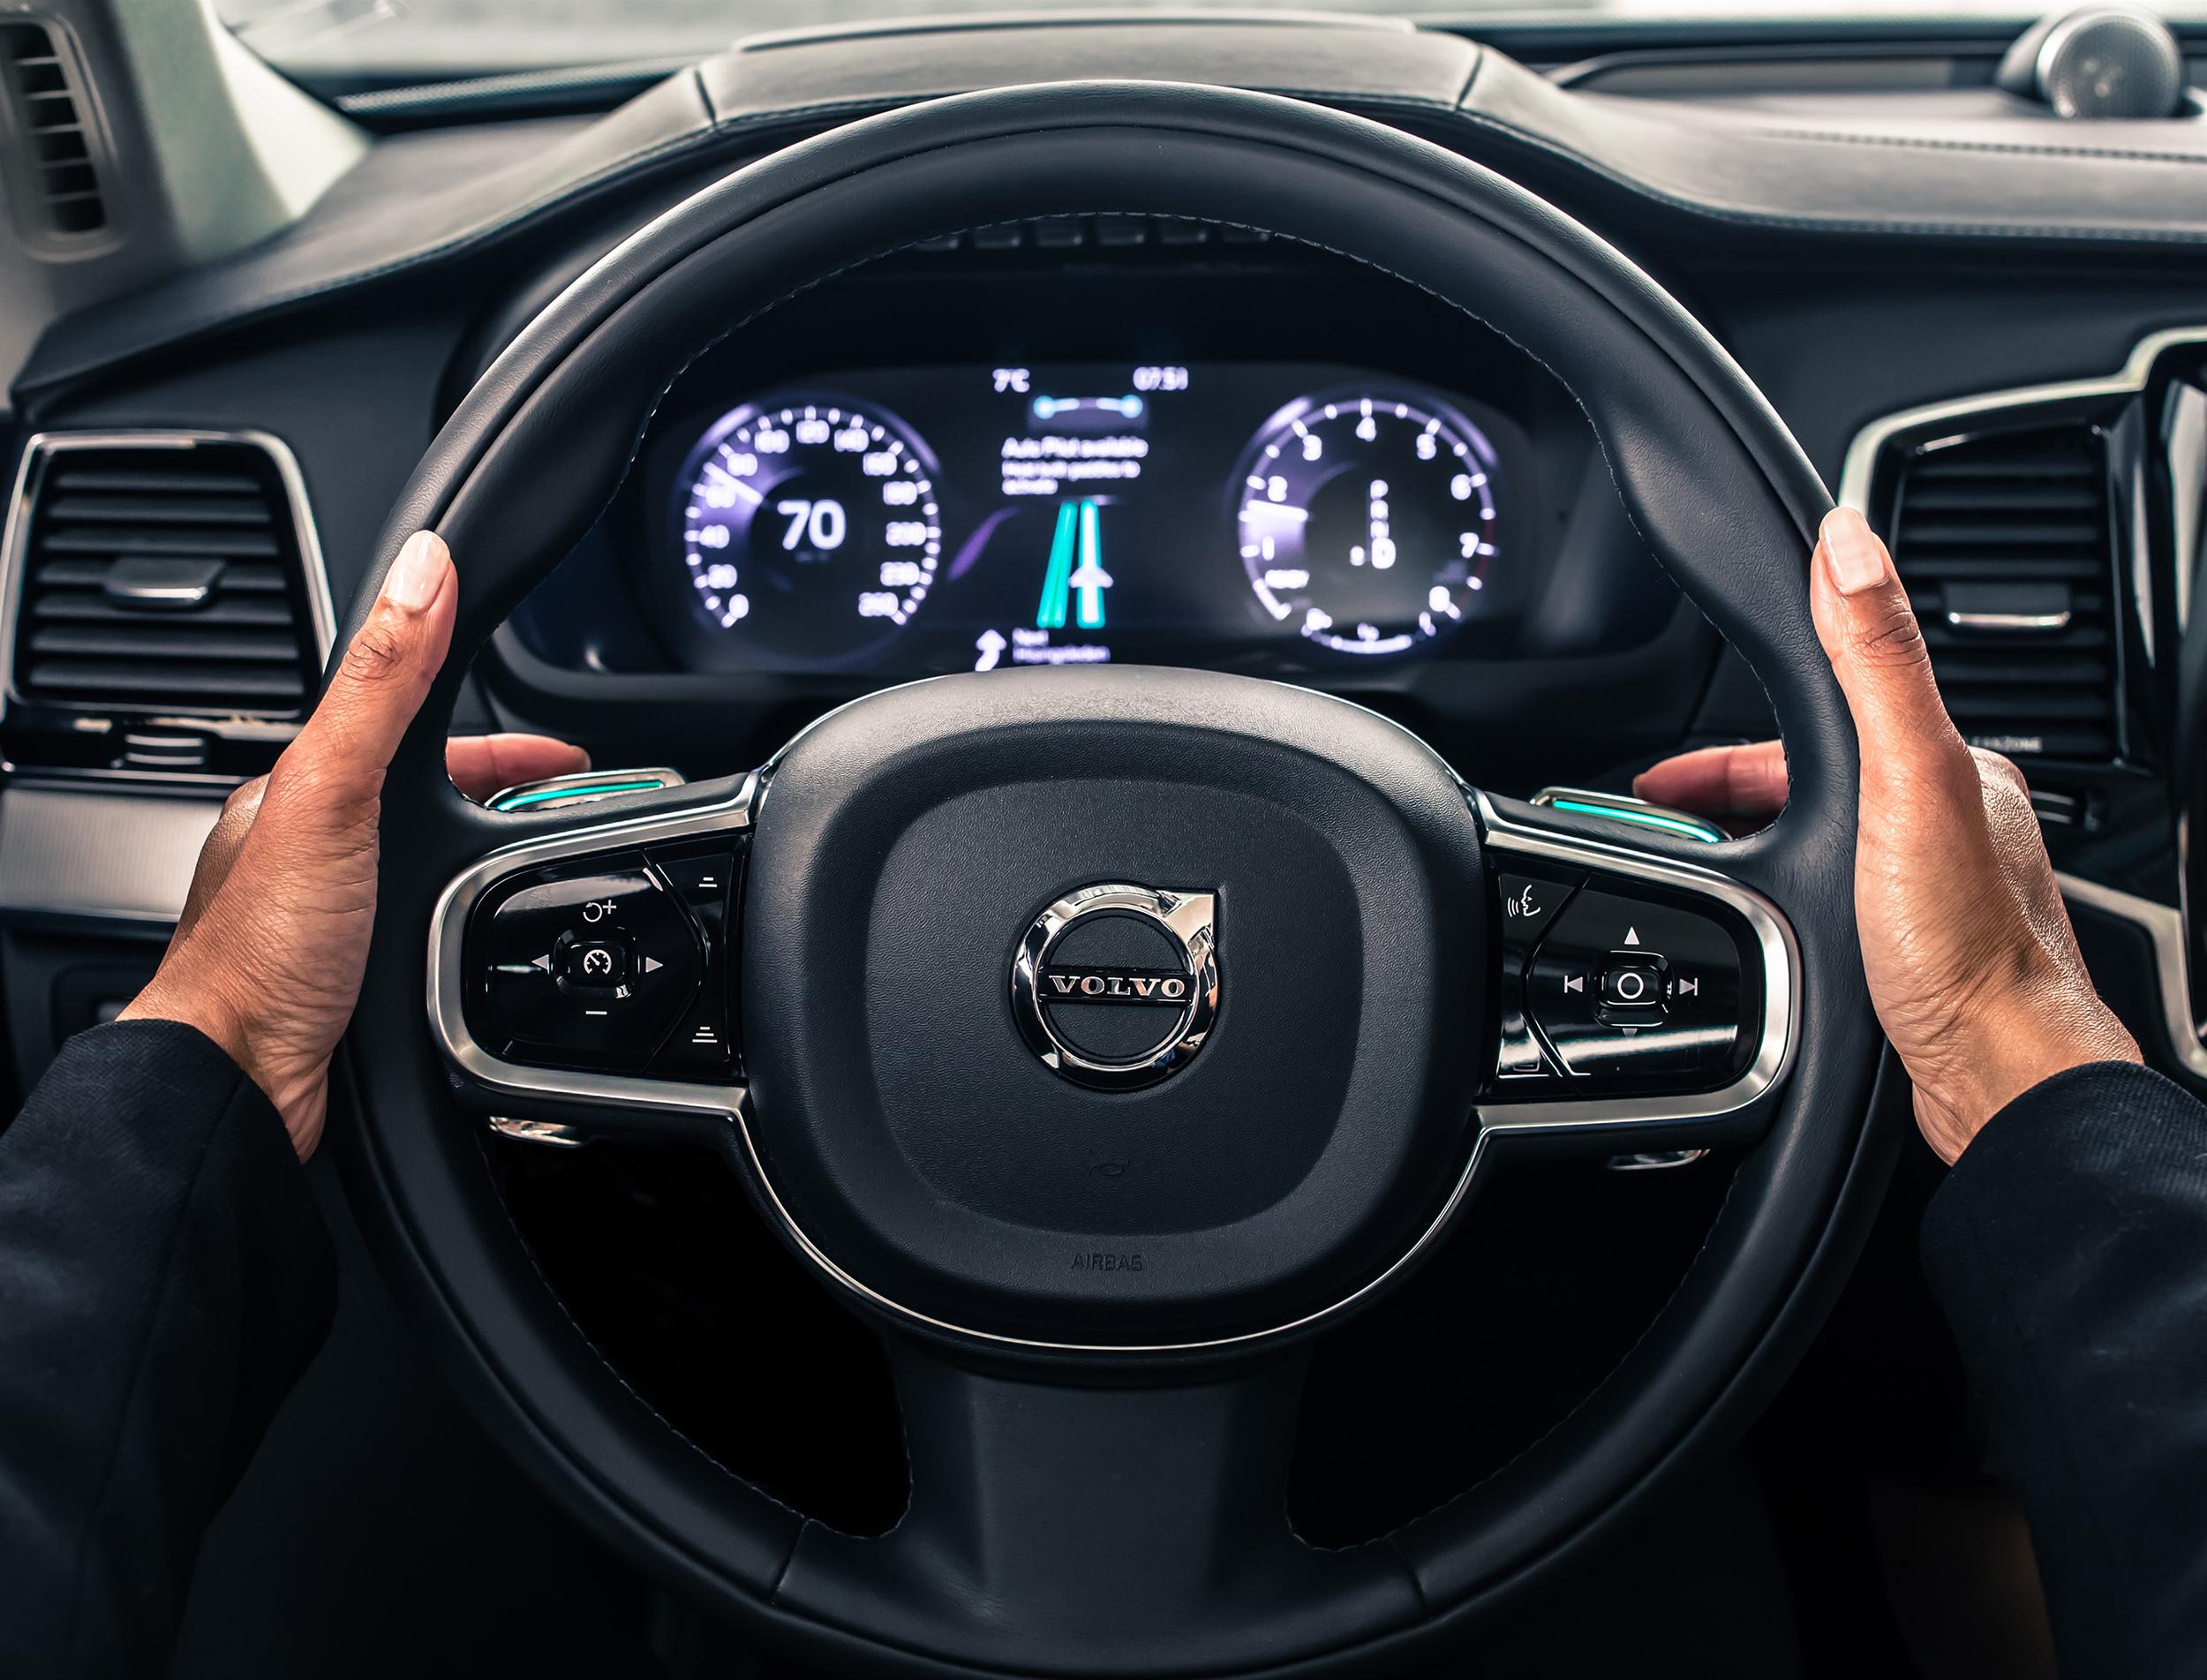 167925_IntelliSafe_Auto_Pilot_interface.jpg